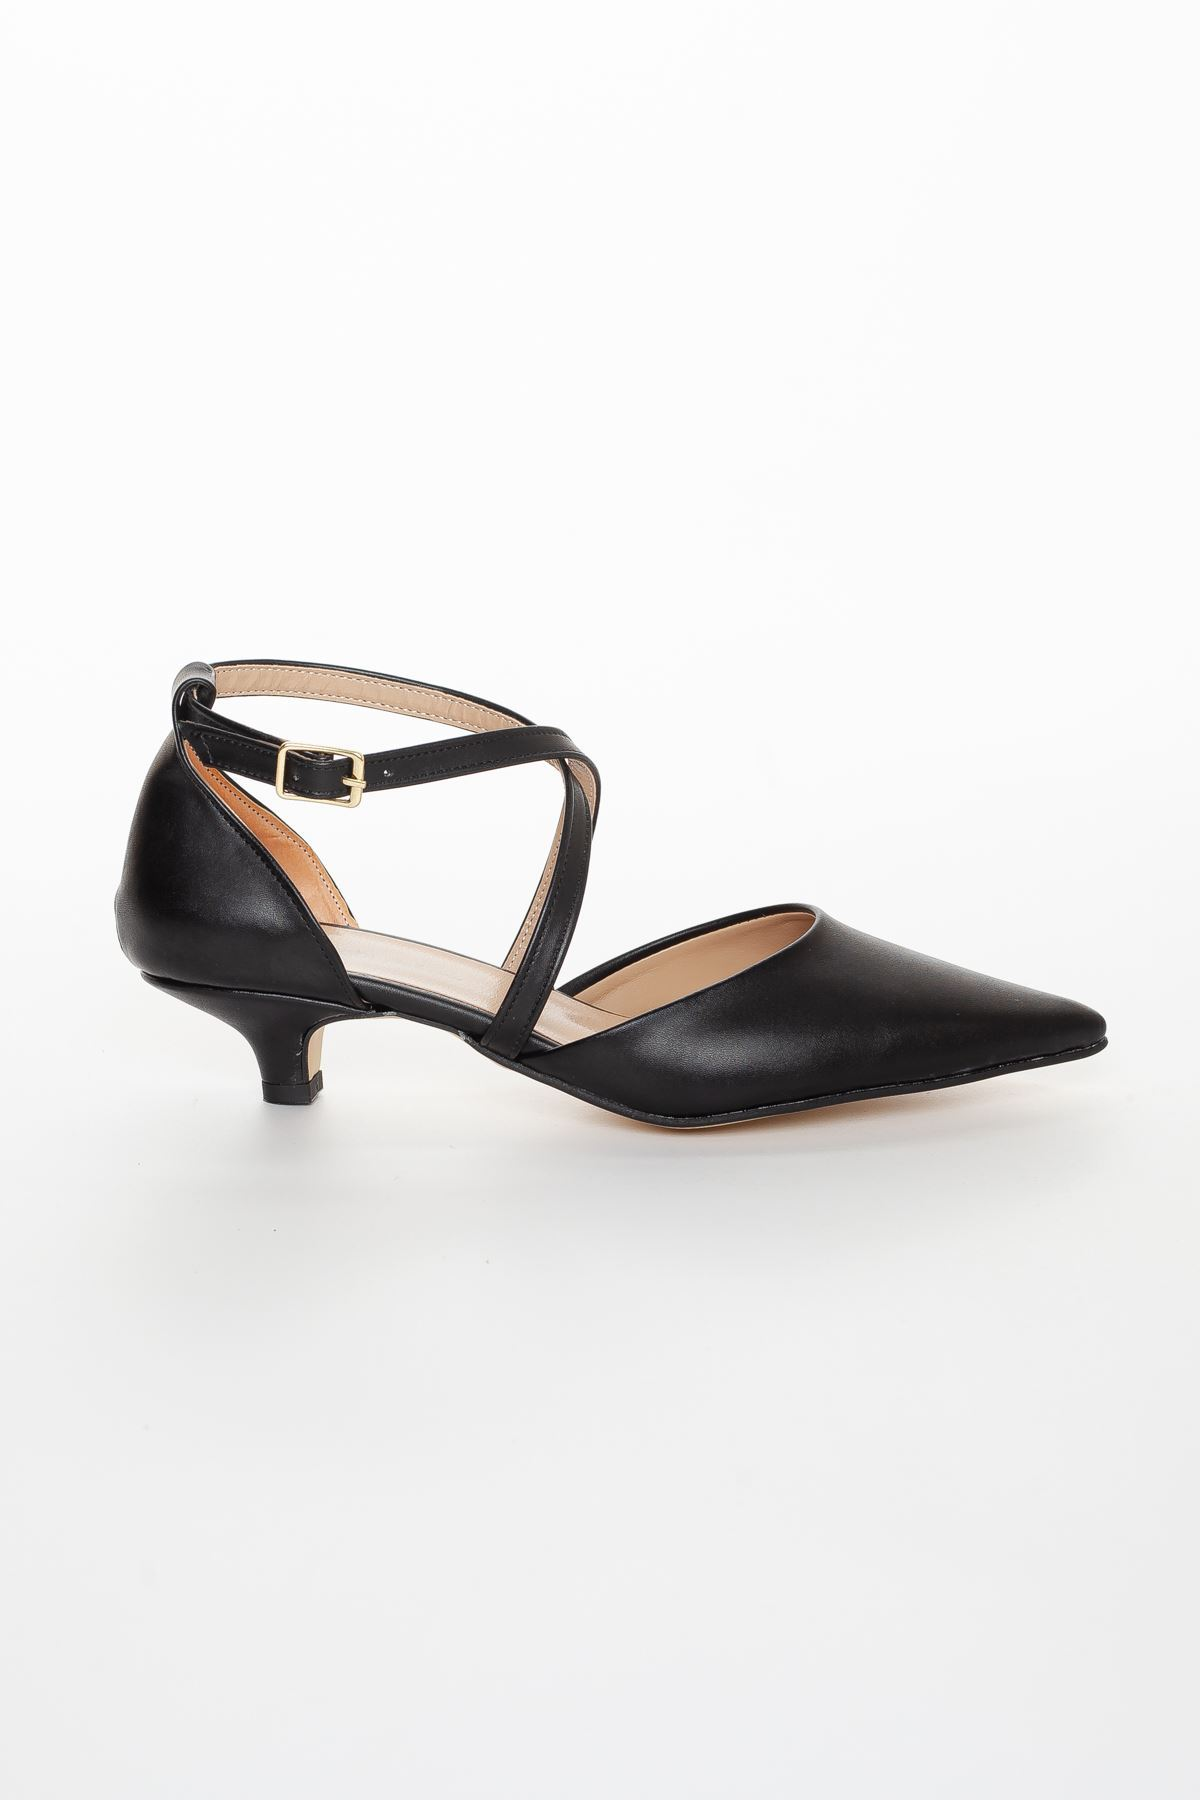 Balmi Sivri Burun Kısa Topuklu Ayakkabı Siyah